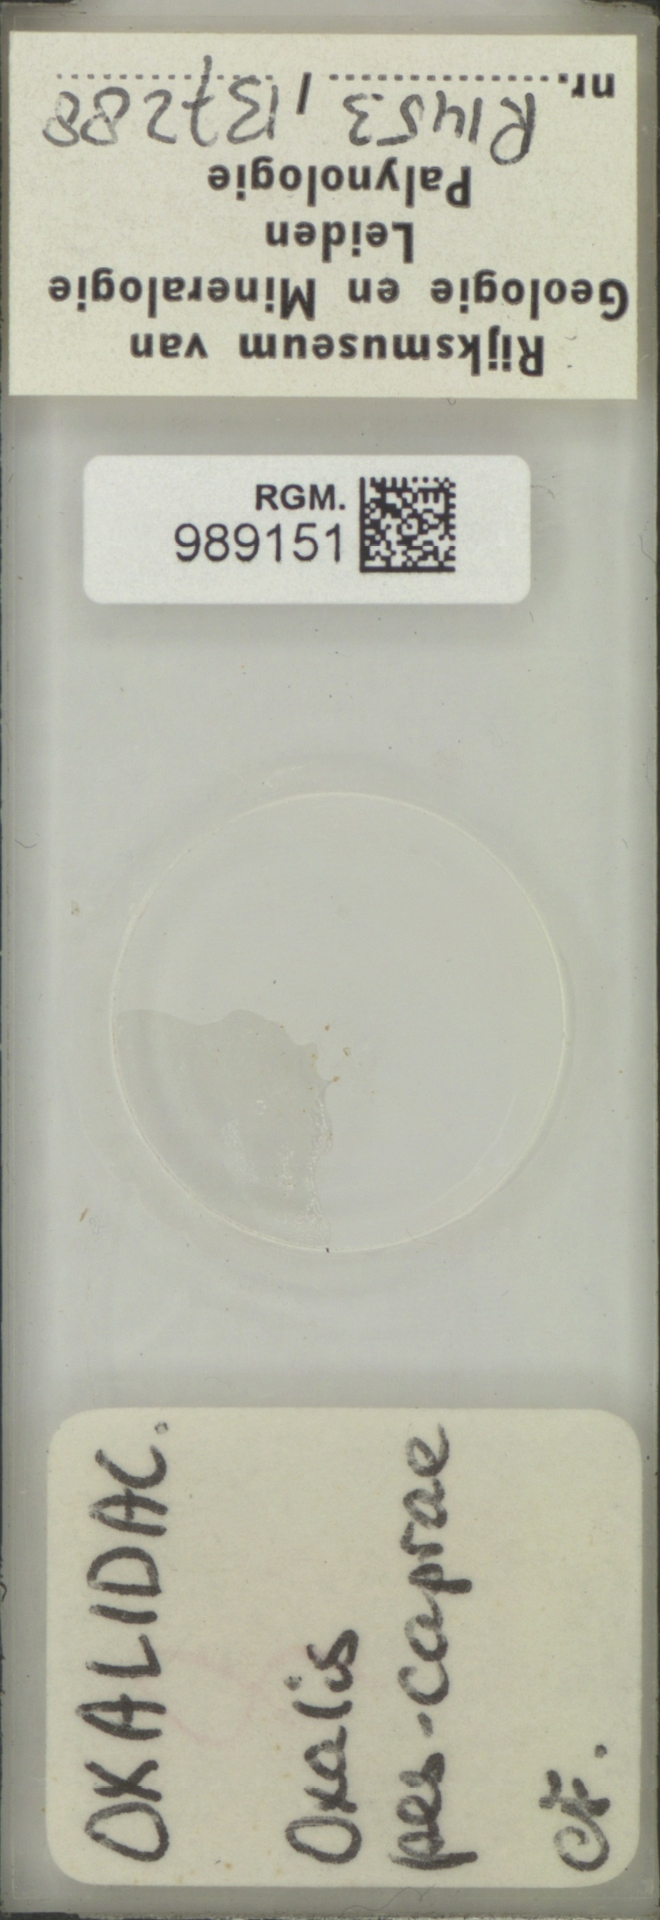 RGM.989151   Oxalis pes-caprae